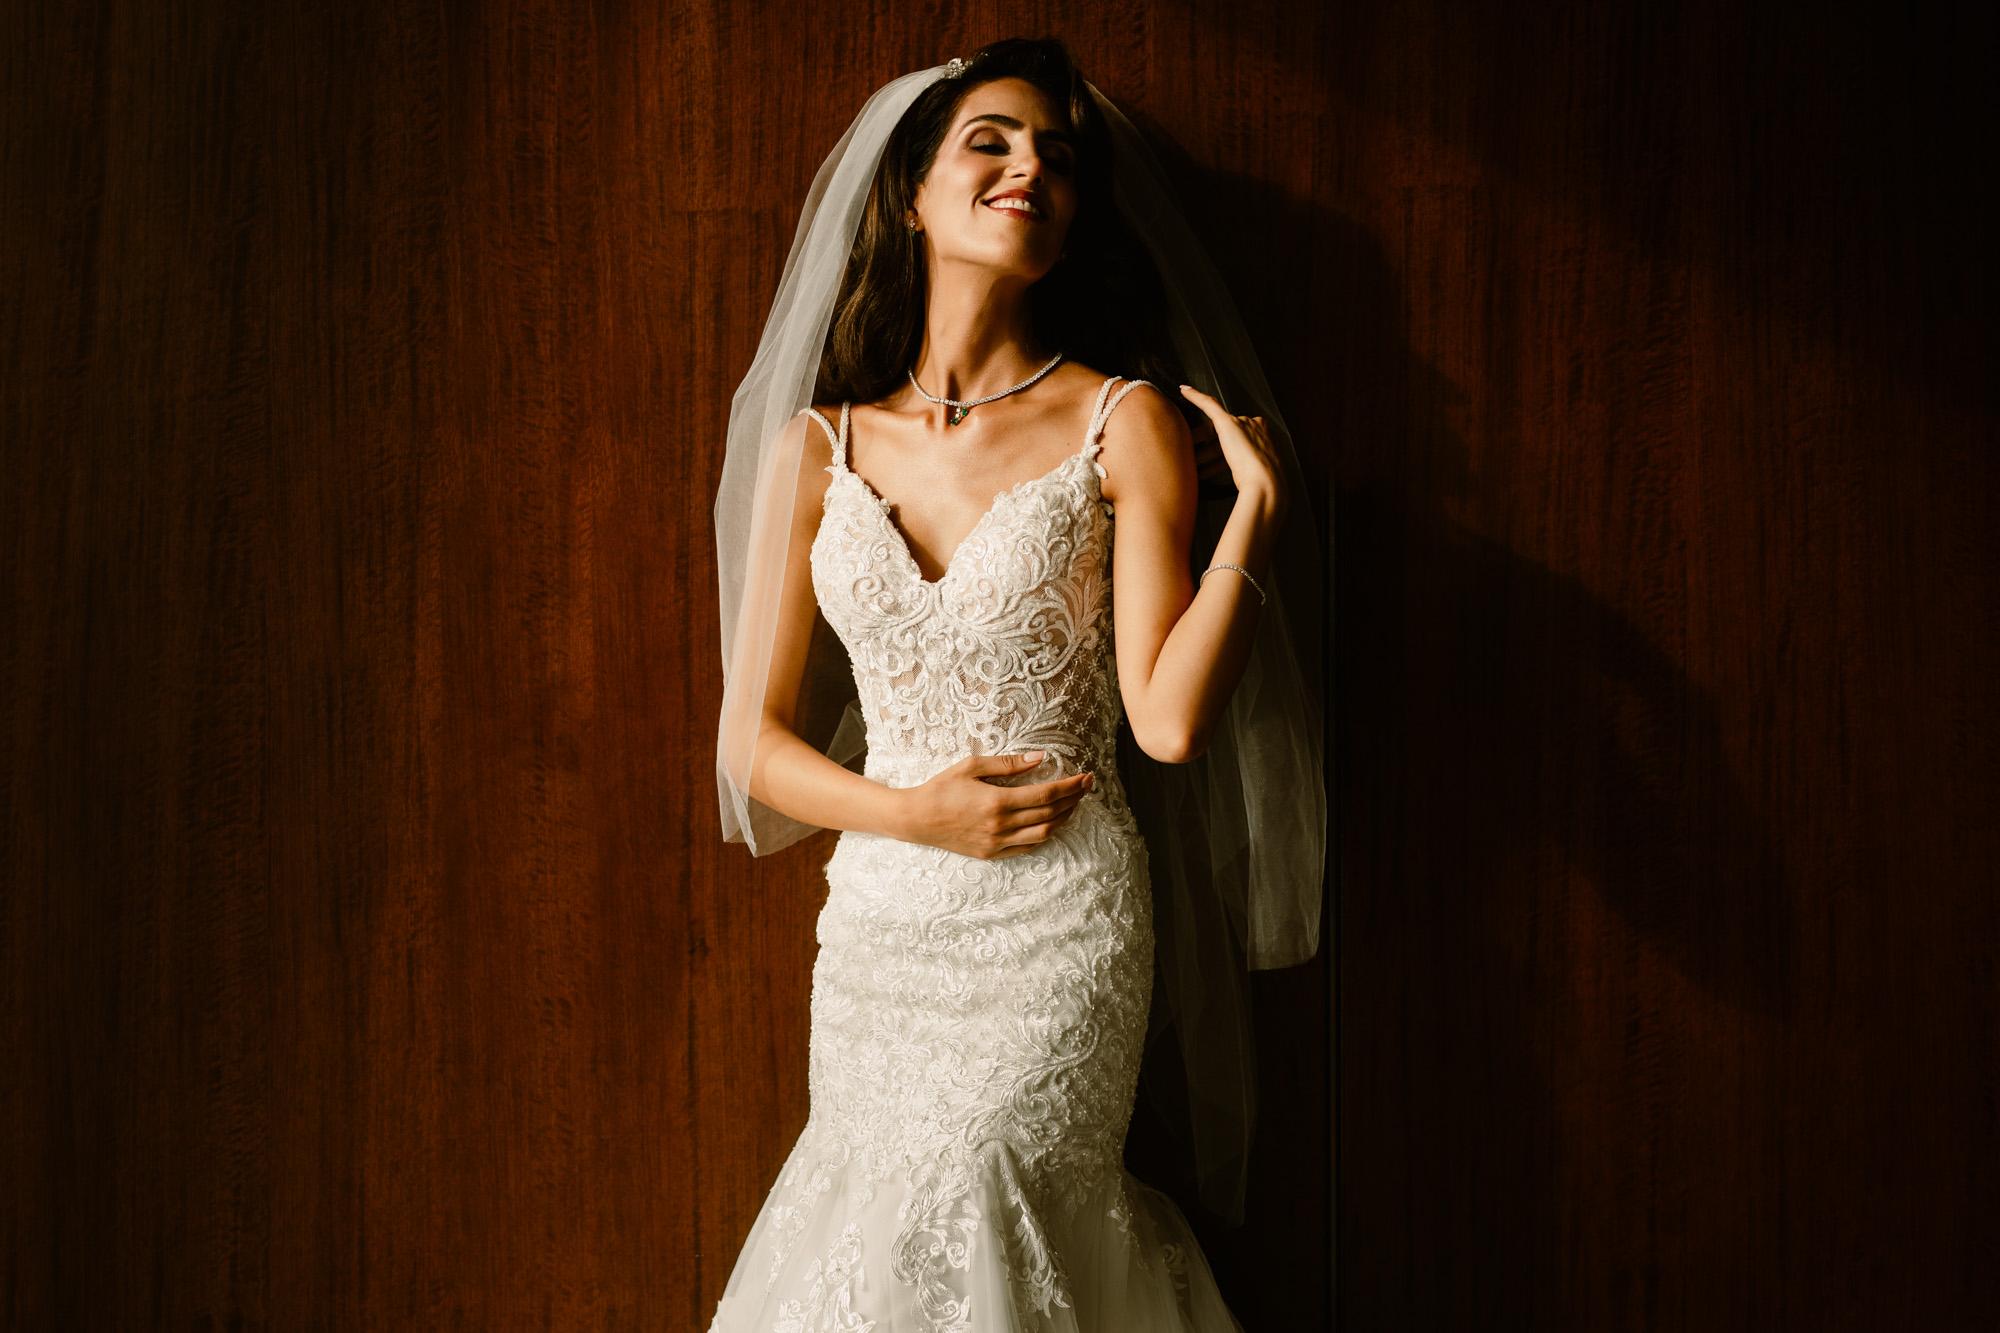 bride-portrait-against-wood-wall-miki-studios